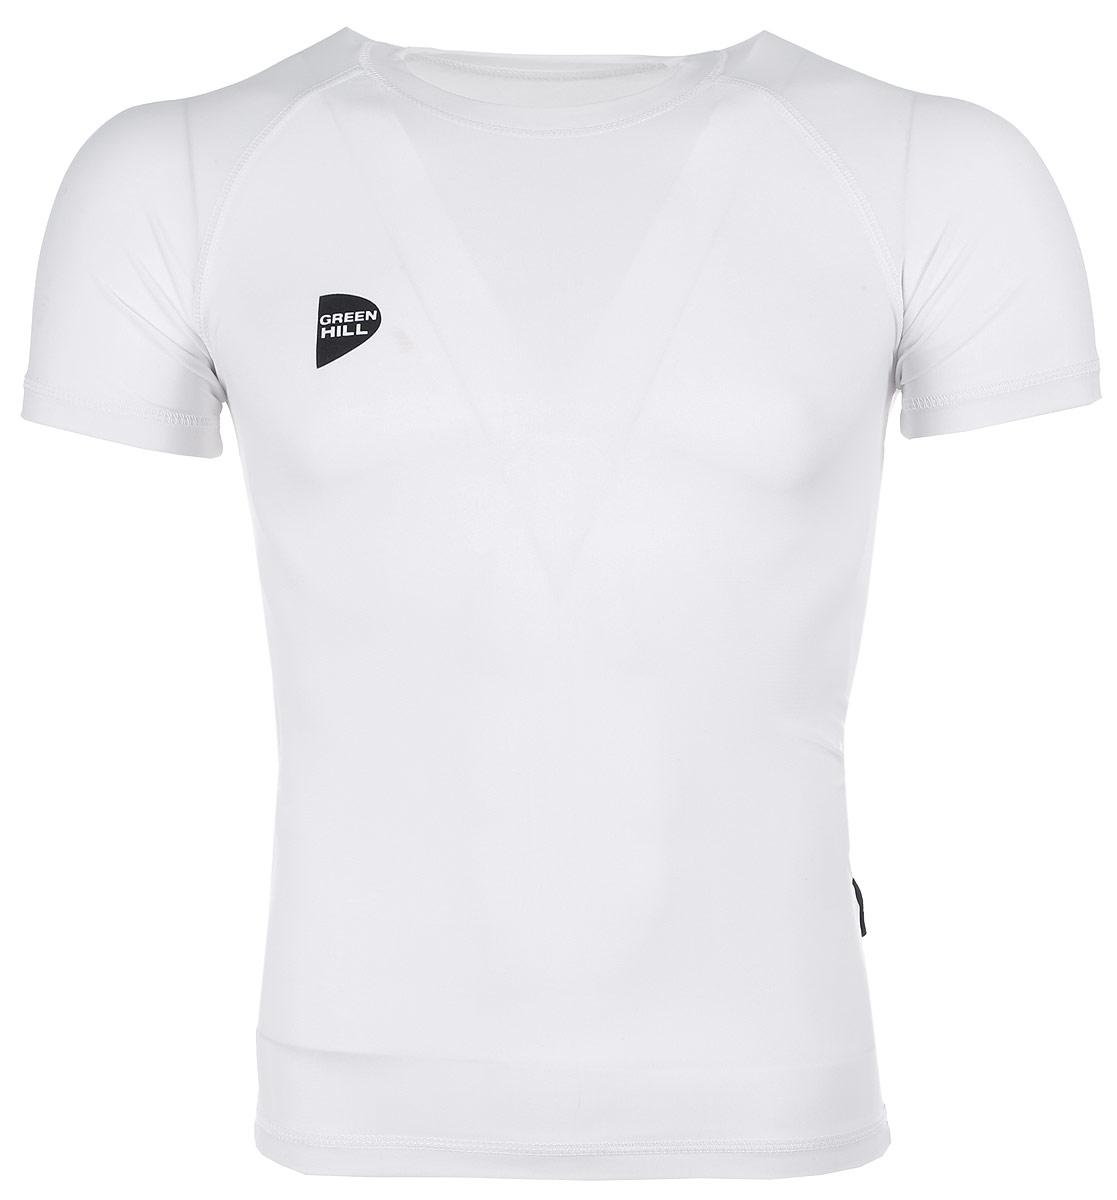 Защитная футболка Green Hill, цвет: белый. Размер XXL. RGS-3558SX4120-001Защитная футболка с логотипом дзюдо. Материал: полиэстер/лайкра. Размеры: Длина 74 см ширина 47 см